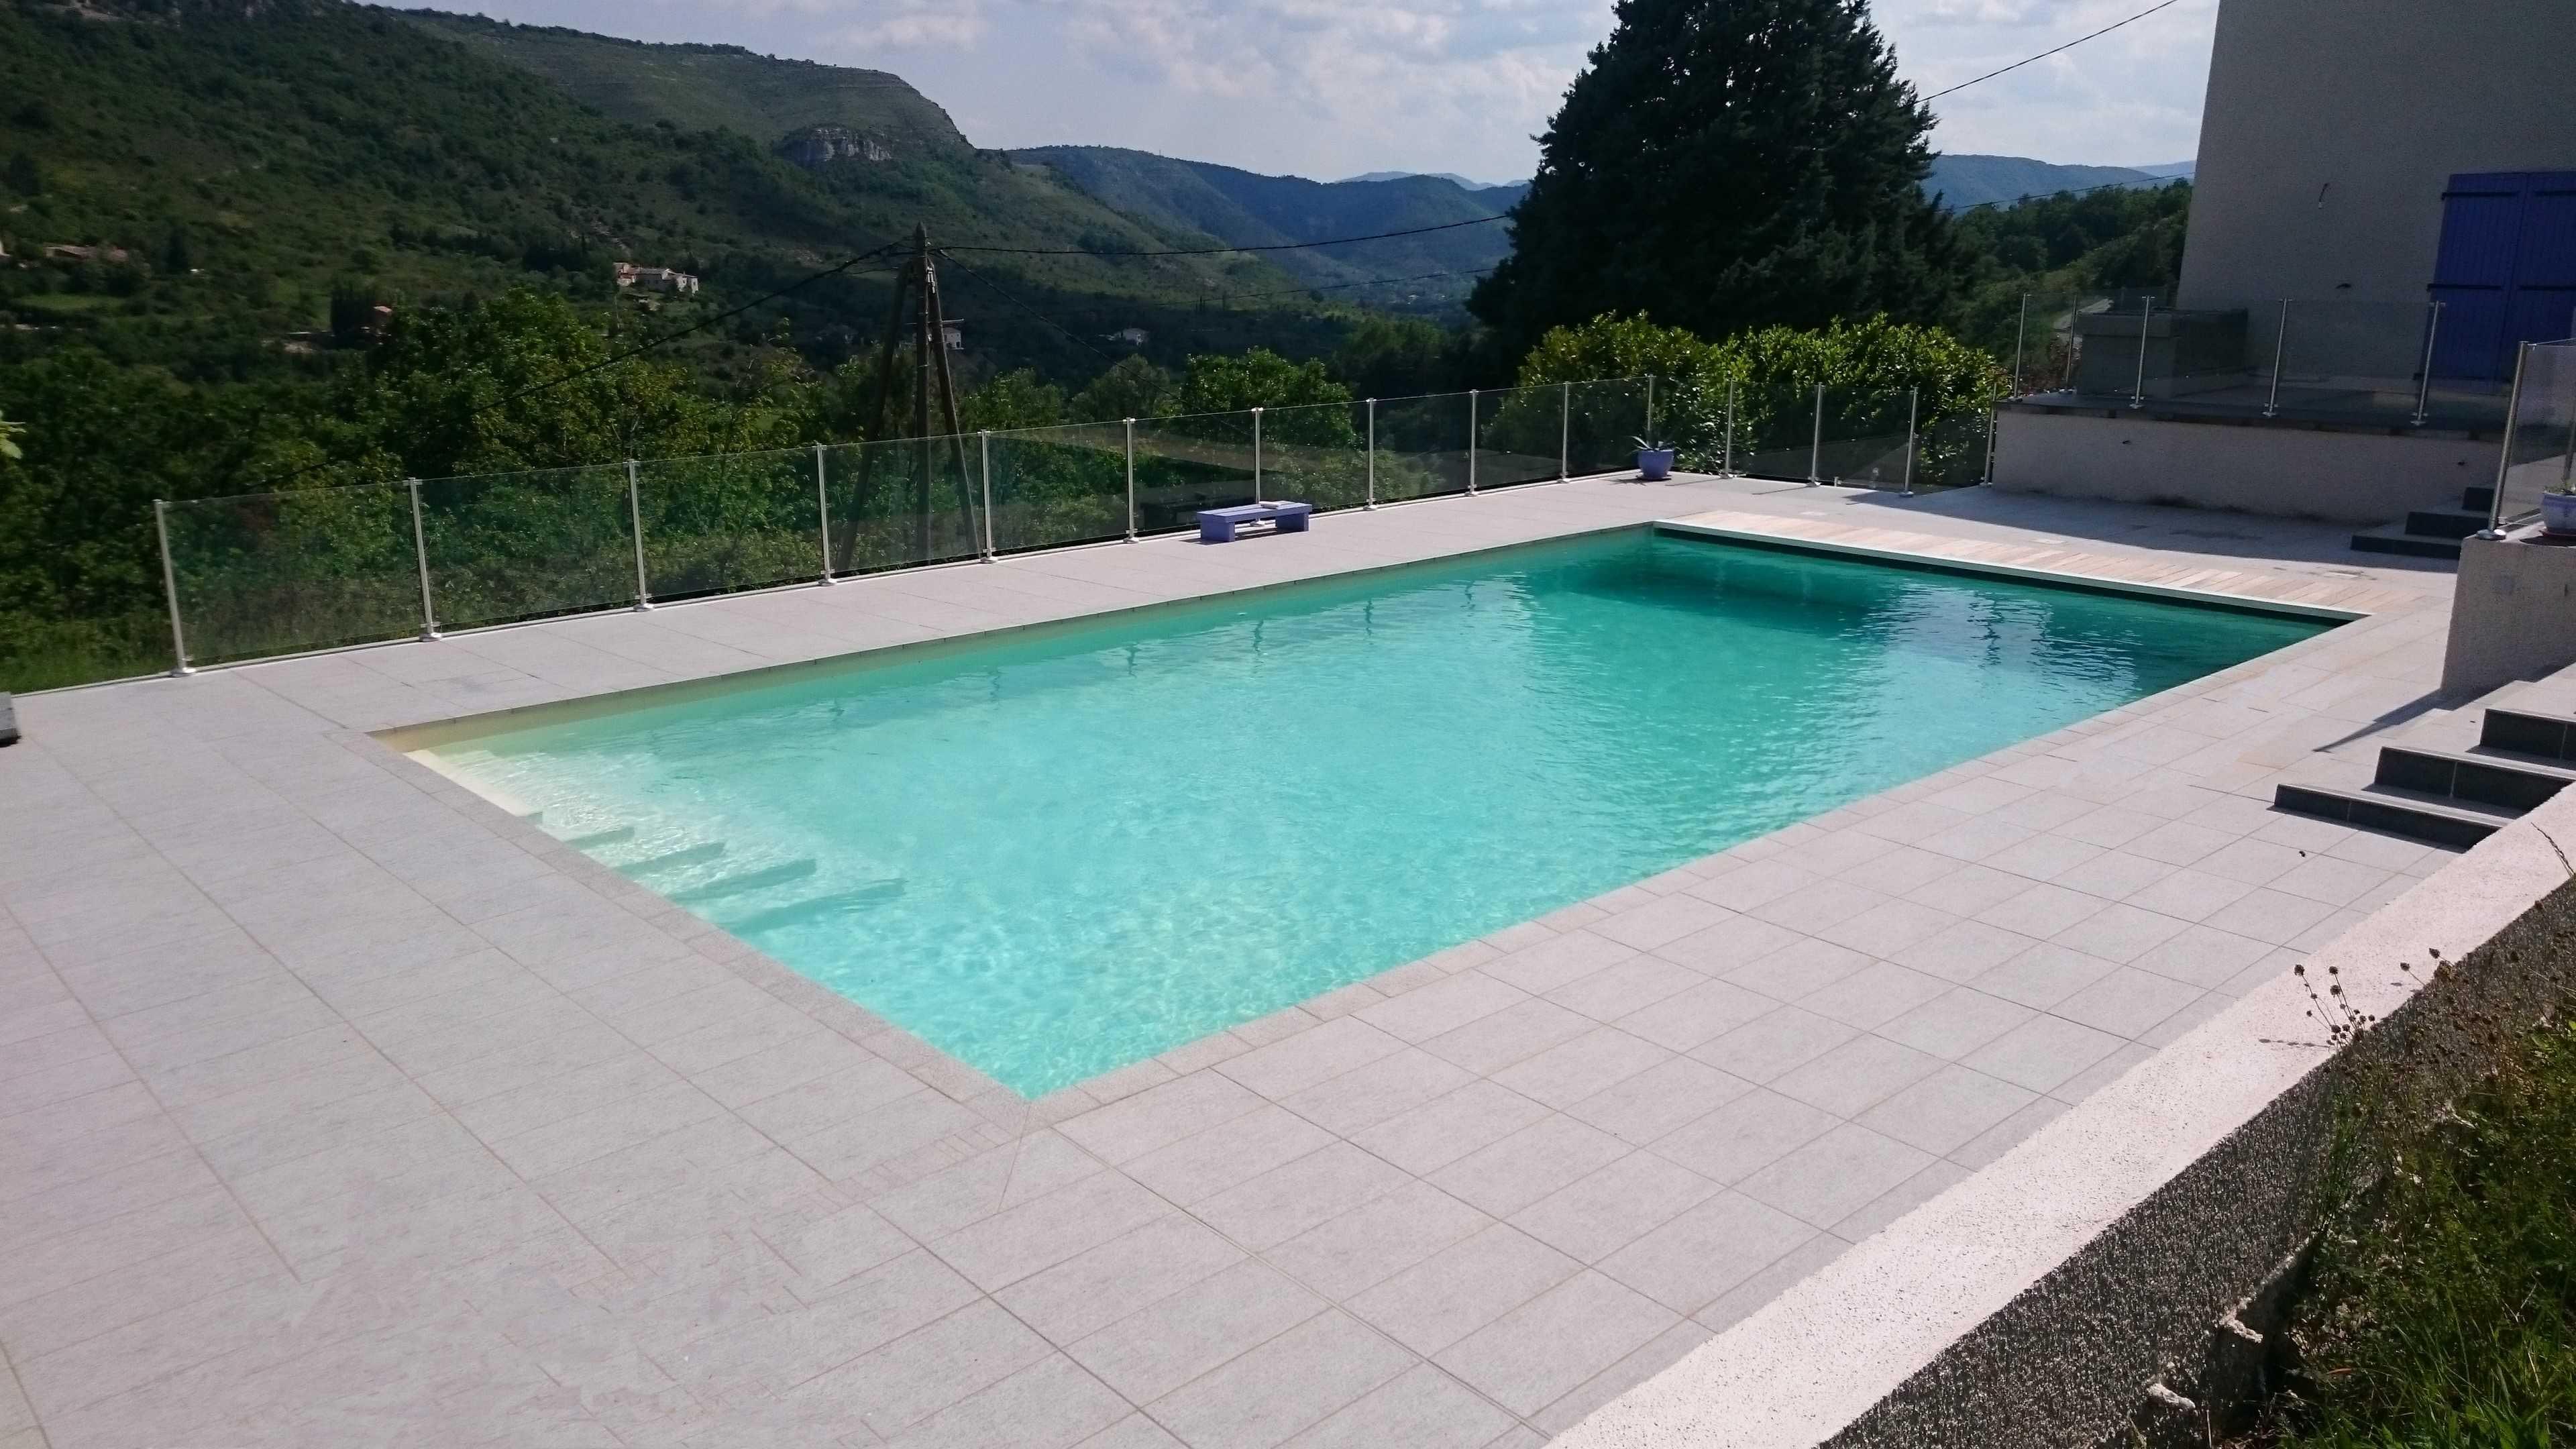 Constructeur de piscine constructeur de piscine en b ton for Constructeur de piscine